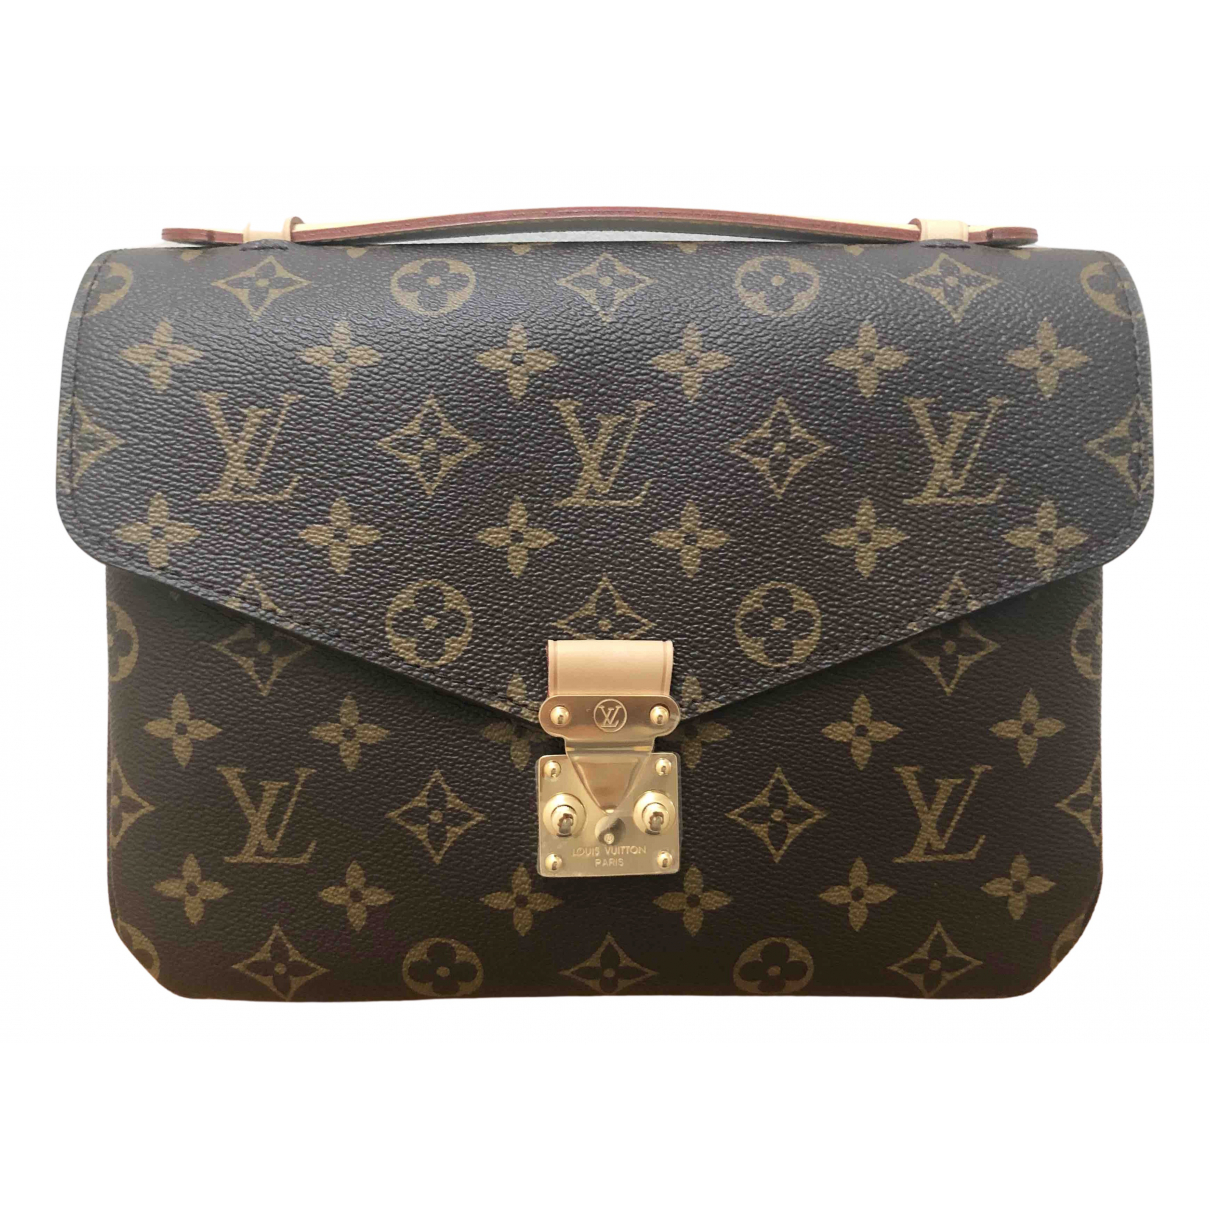 Louis Vuitton - Sac a main Metis pour femme en toile - marron